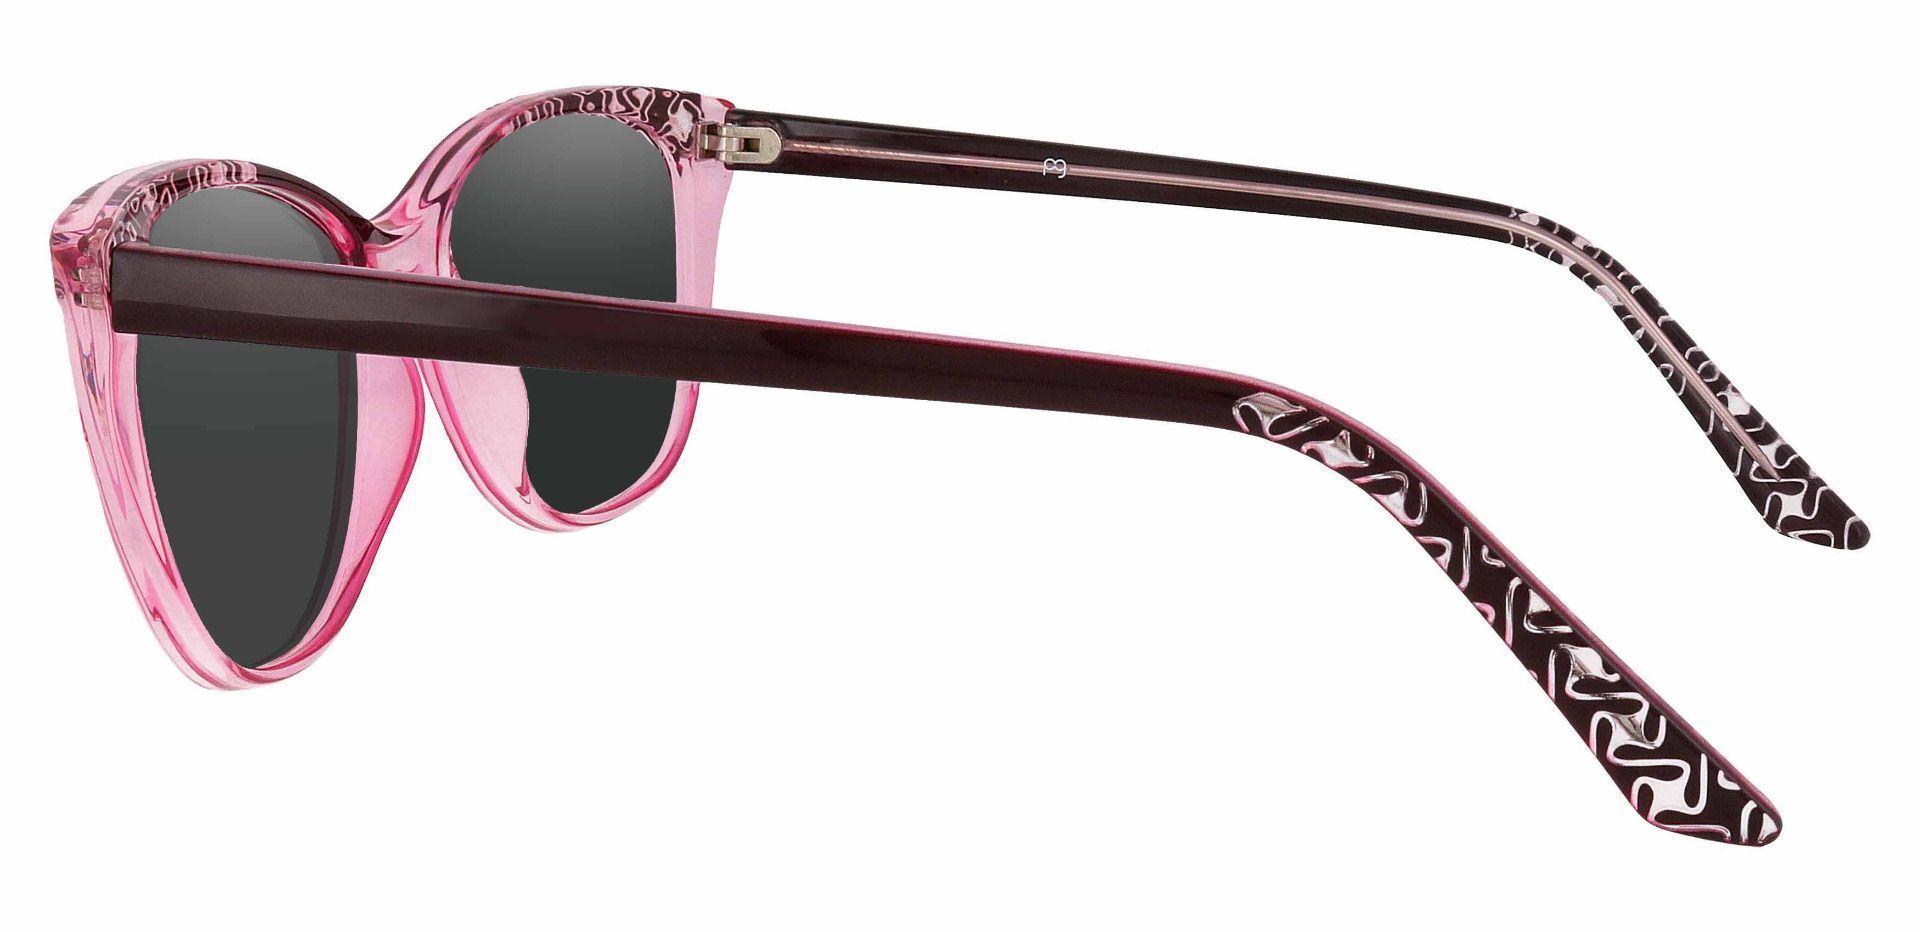 Alberta Cat Eye Progressive Sunglasses - Pink Frame With Gray Lenses